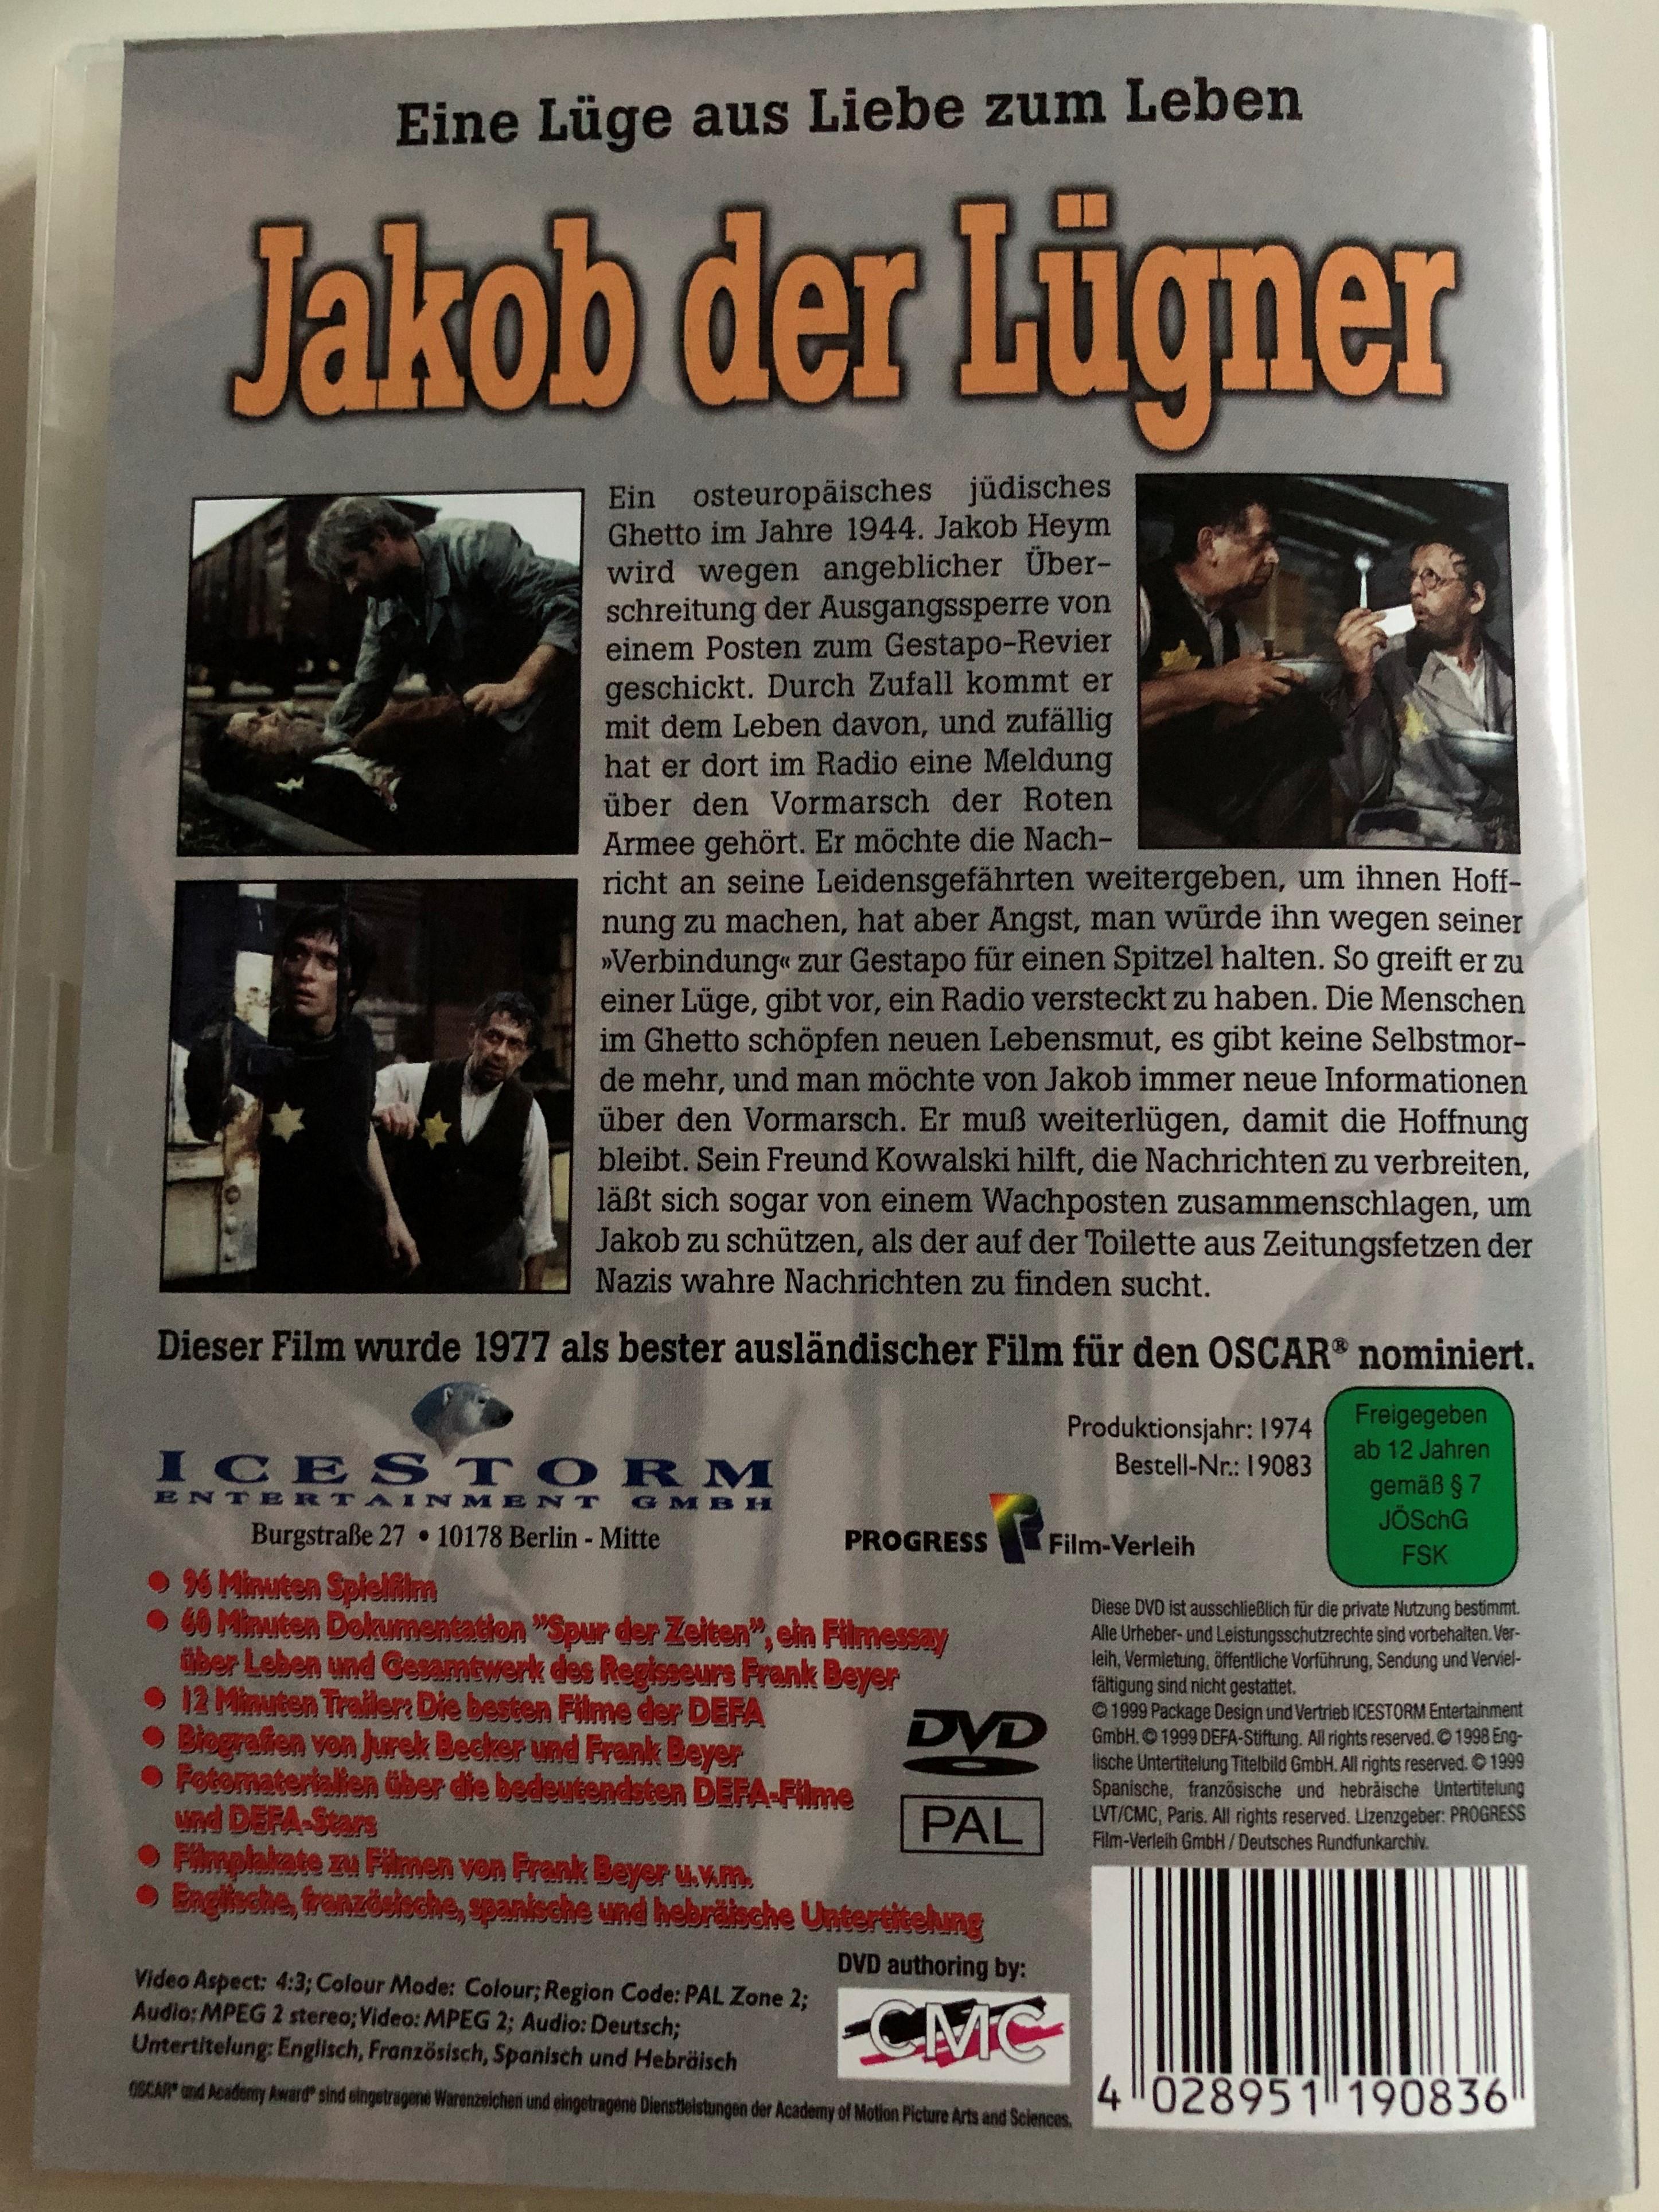 jakob-der-l-gner-dvd-1975-jacob-the-liar-directed-by-frank-beyer-starring-vlastimil-brodsk-armin-mueller-stahl-nach-dem-gleichnamigen-roman-von-jurek-becker-2-.jpg